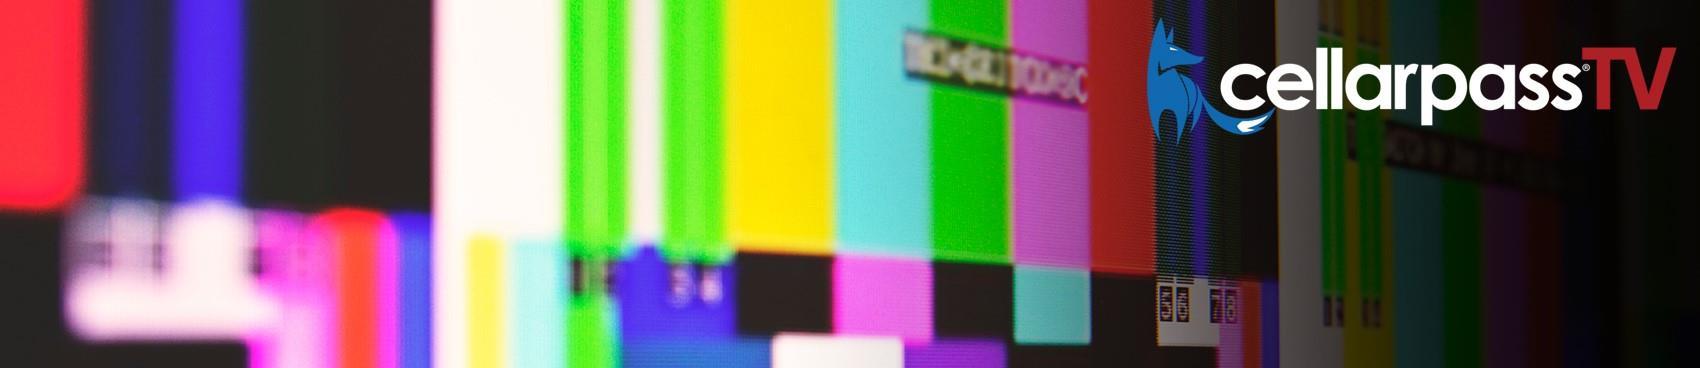 CellarPassTV